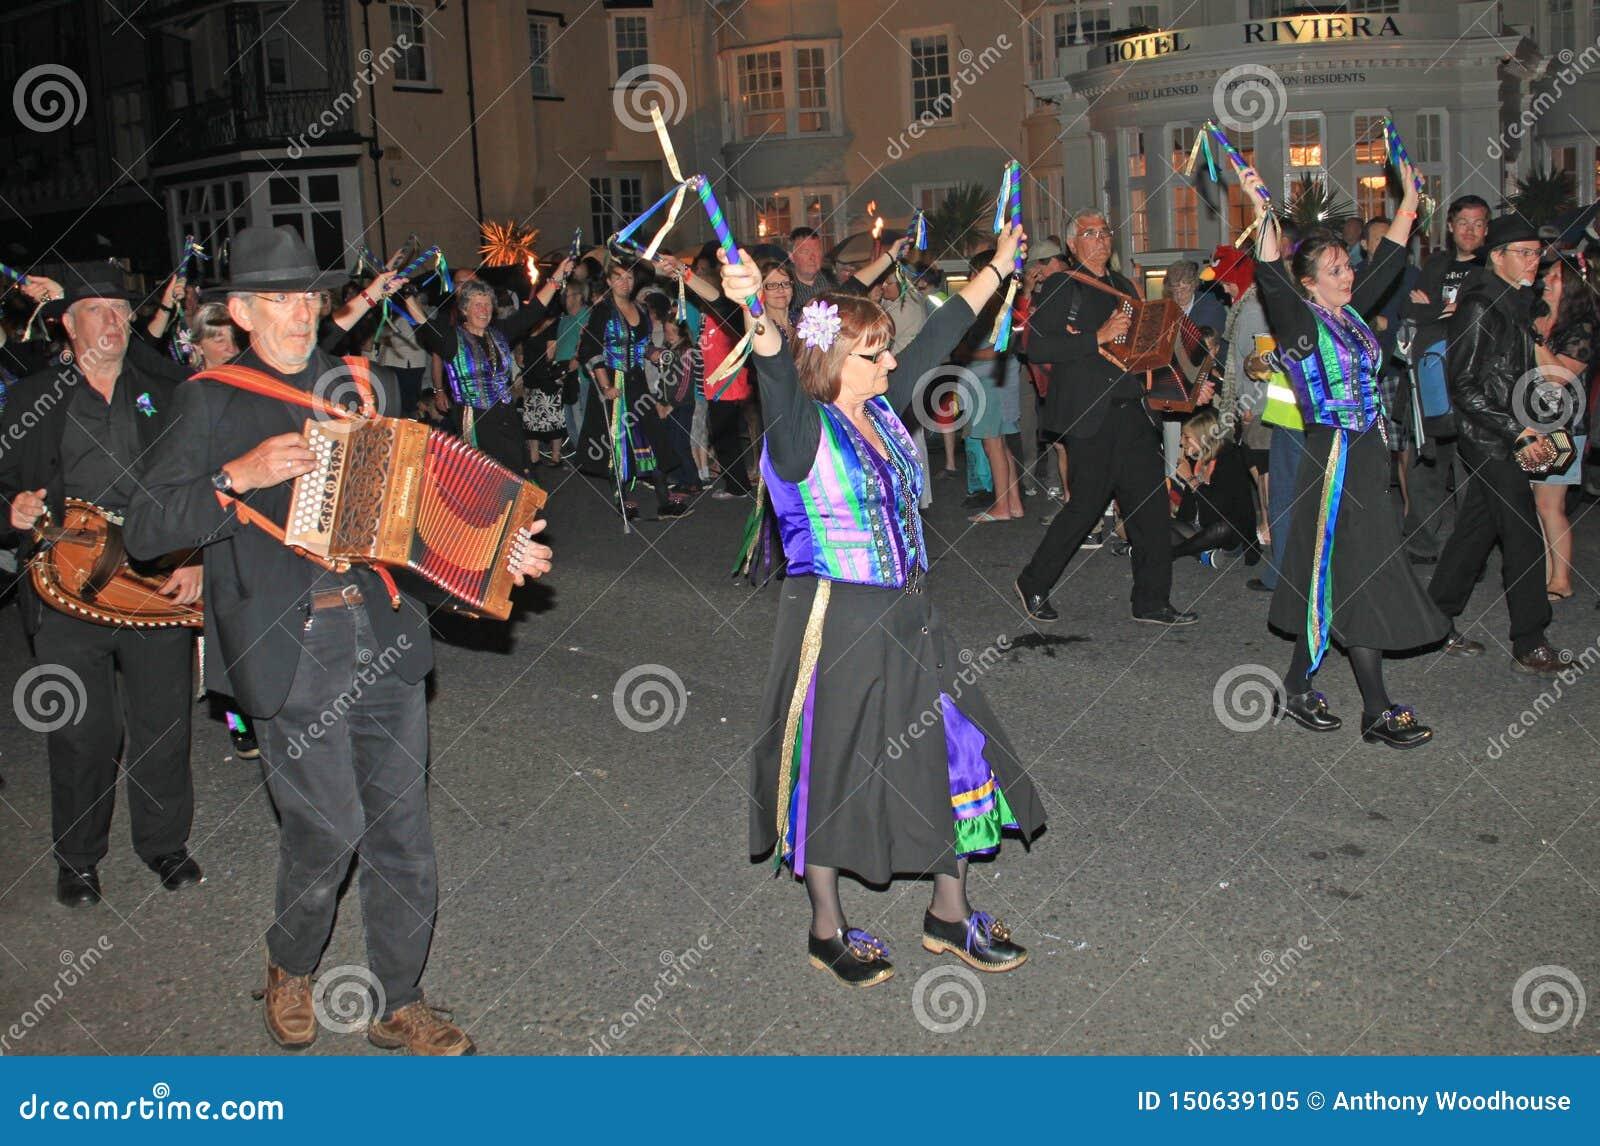 SIDMOUTH, DEVON, ENGELAND - AUGUSTUS TIENDE 2012: Een groep musici en belemmeringsdansers kleedde zich in hun mauve en groen en h